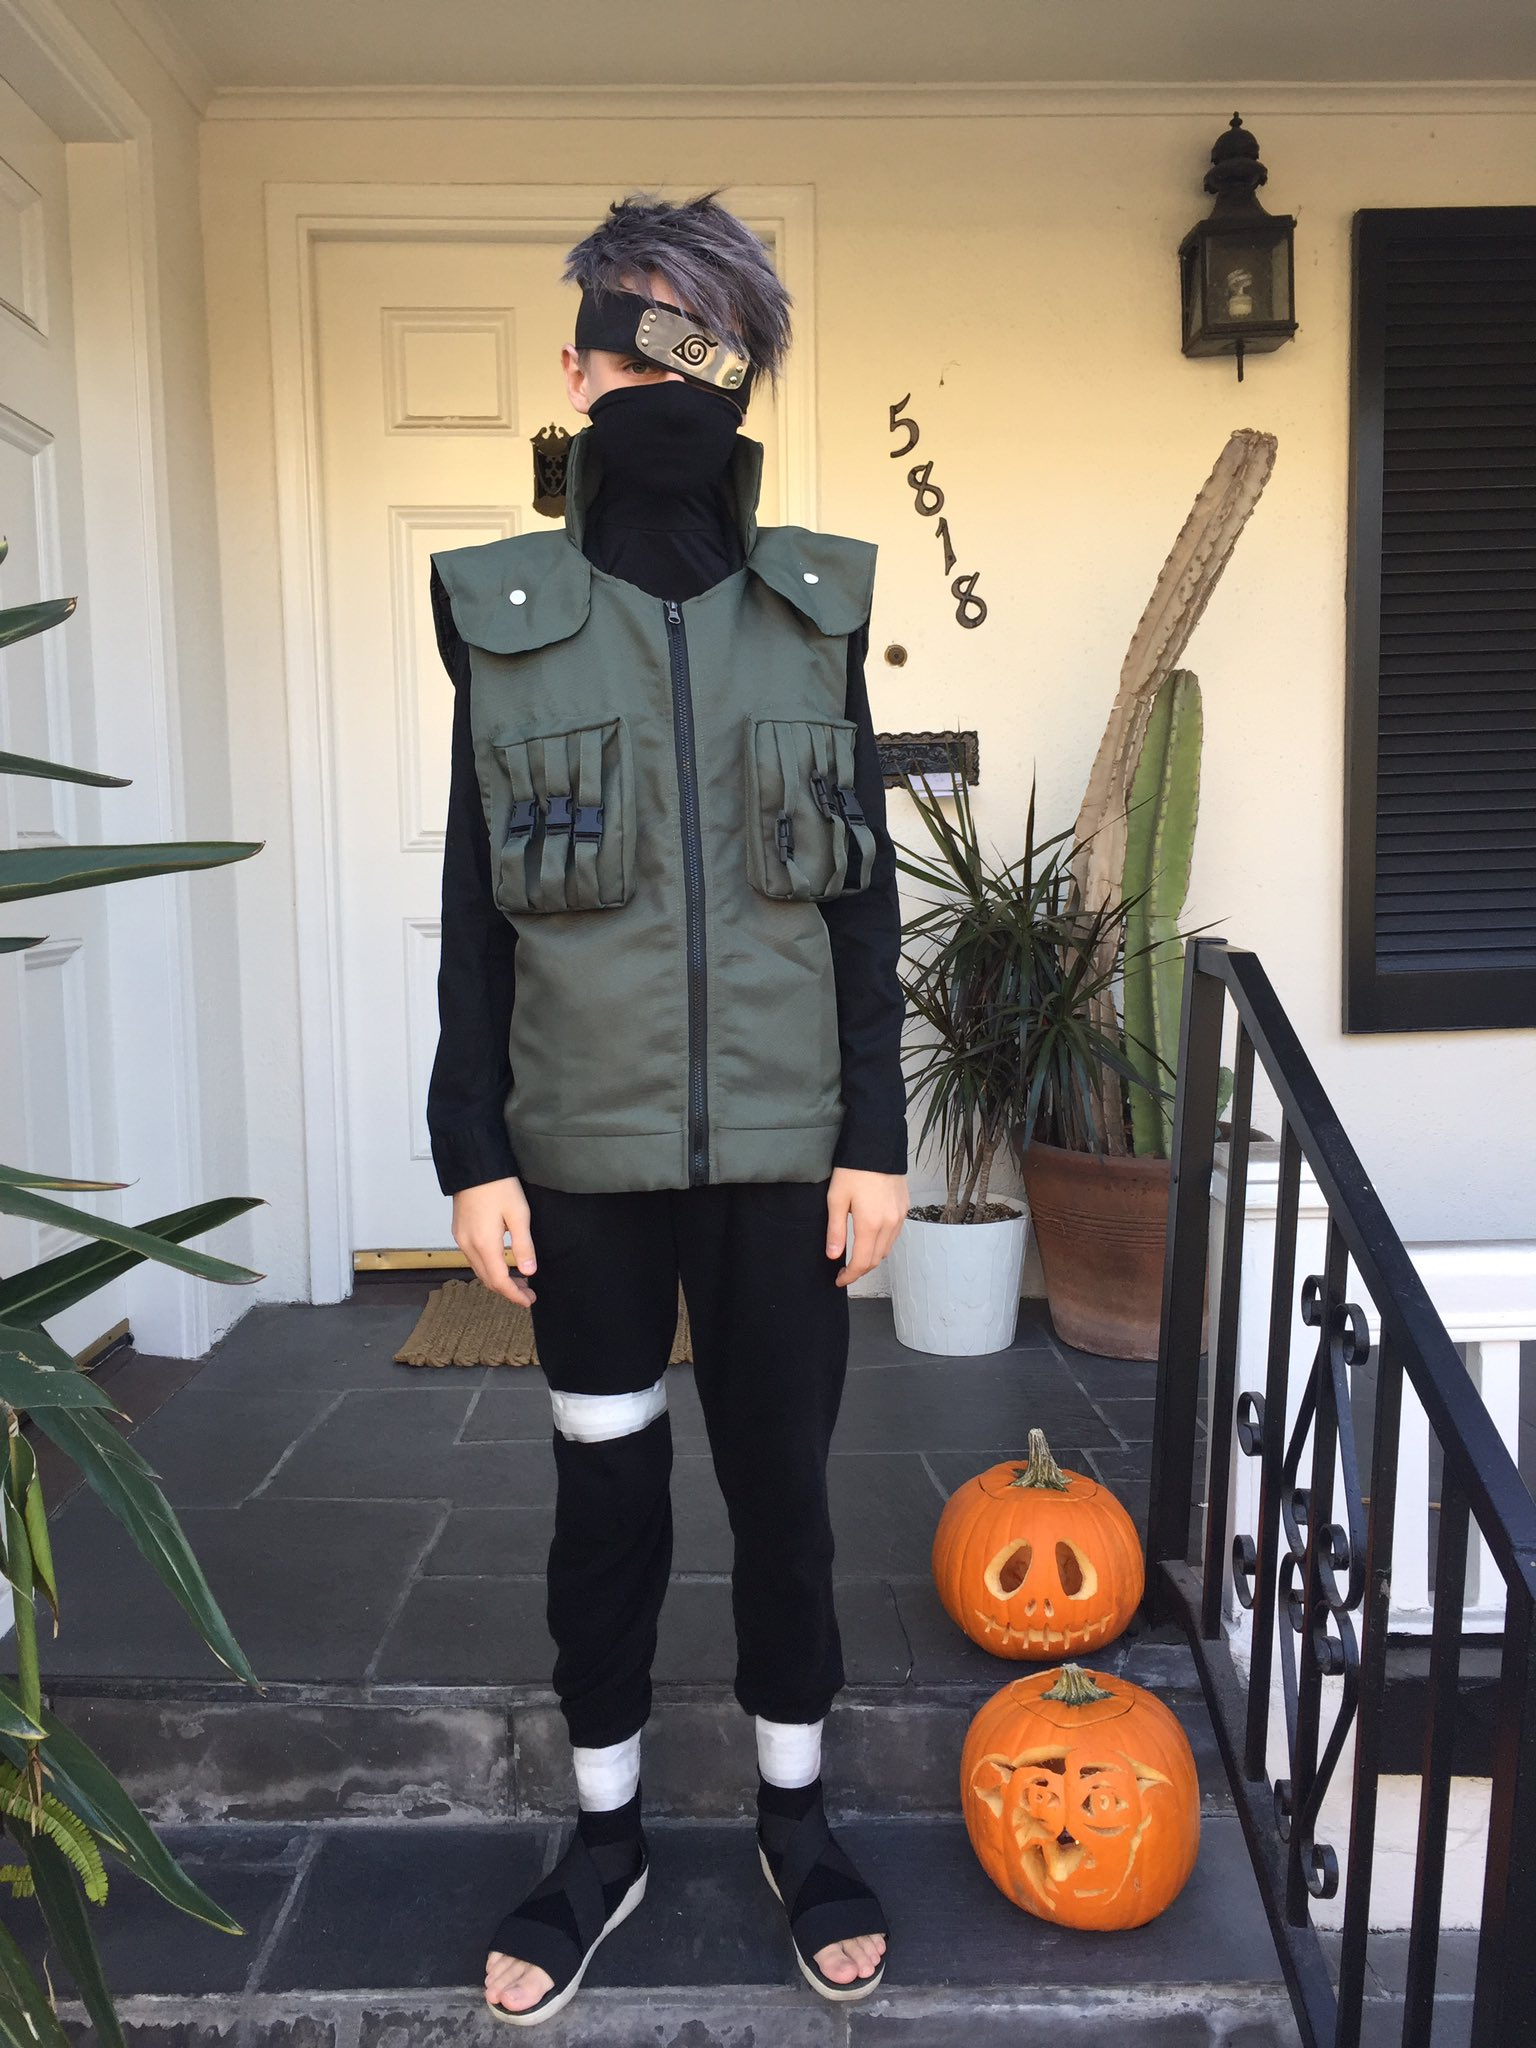 jaeden lieberher on twitter quothappy halloween from kakashi